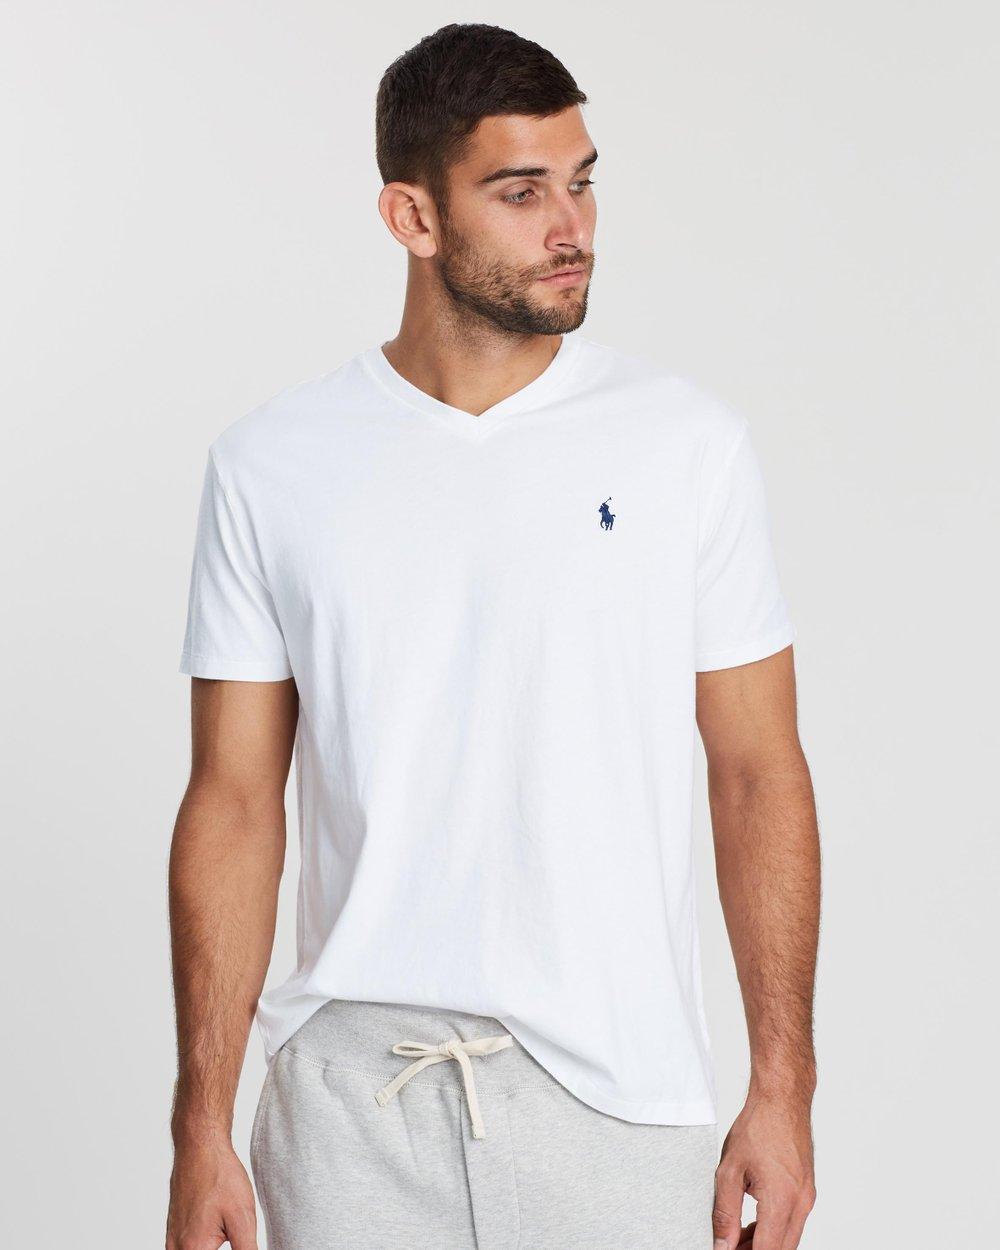 ec5e5f670 Classic Fit V-Neck T-Shirt by Polo Ralph Lauren Online